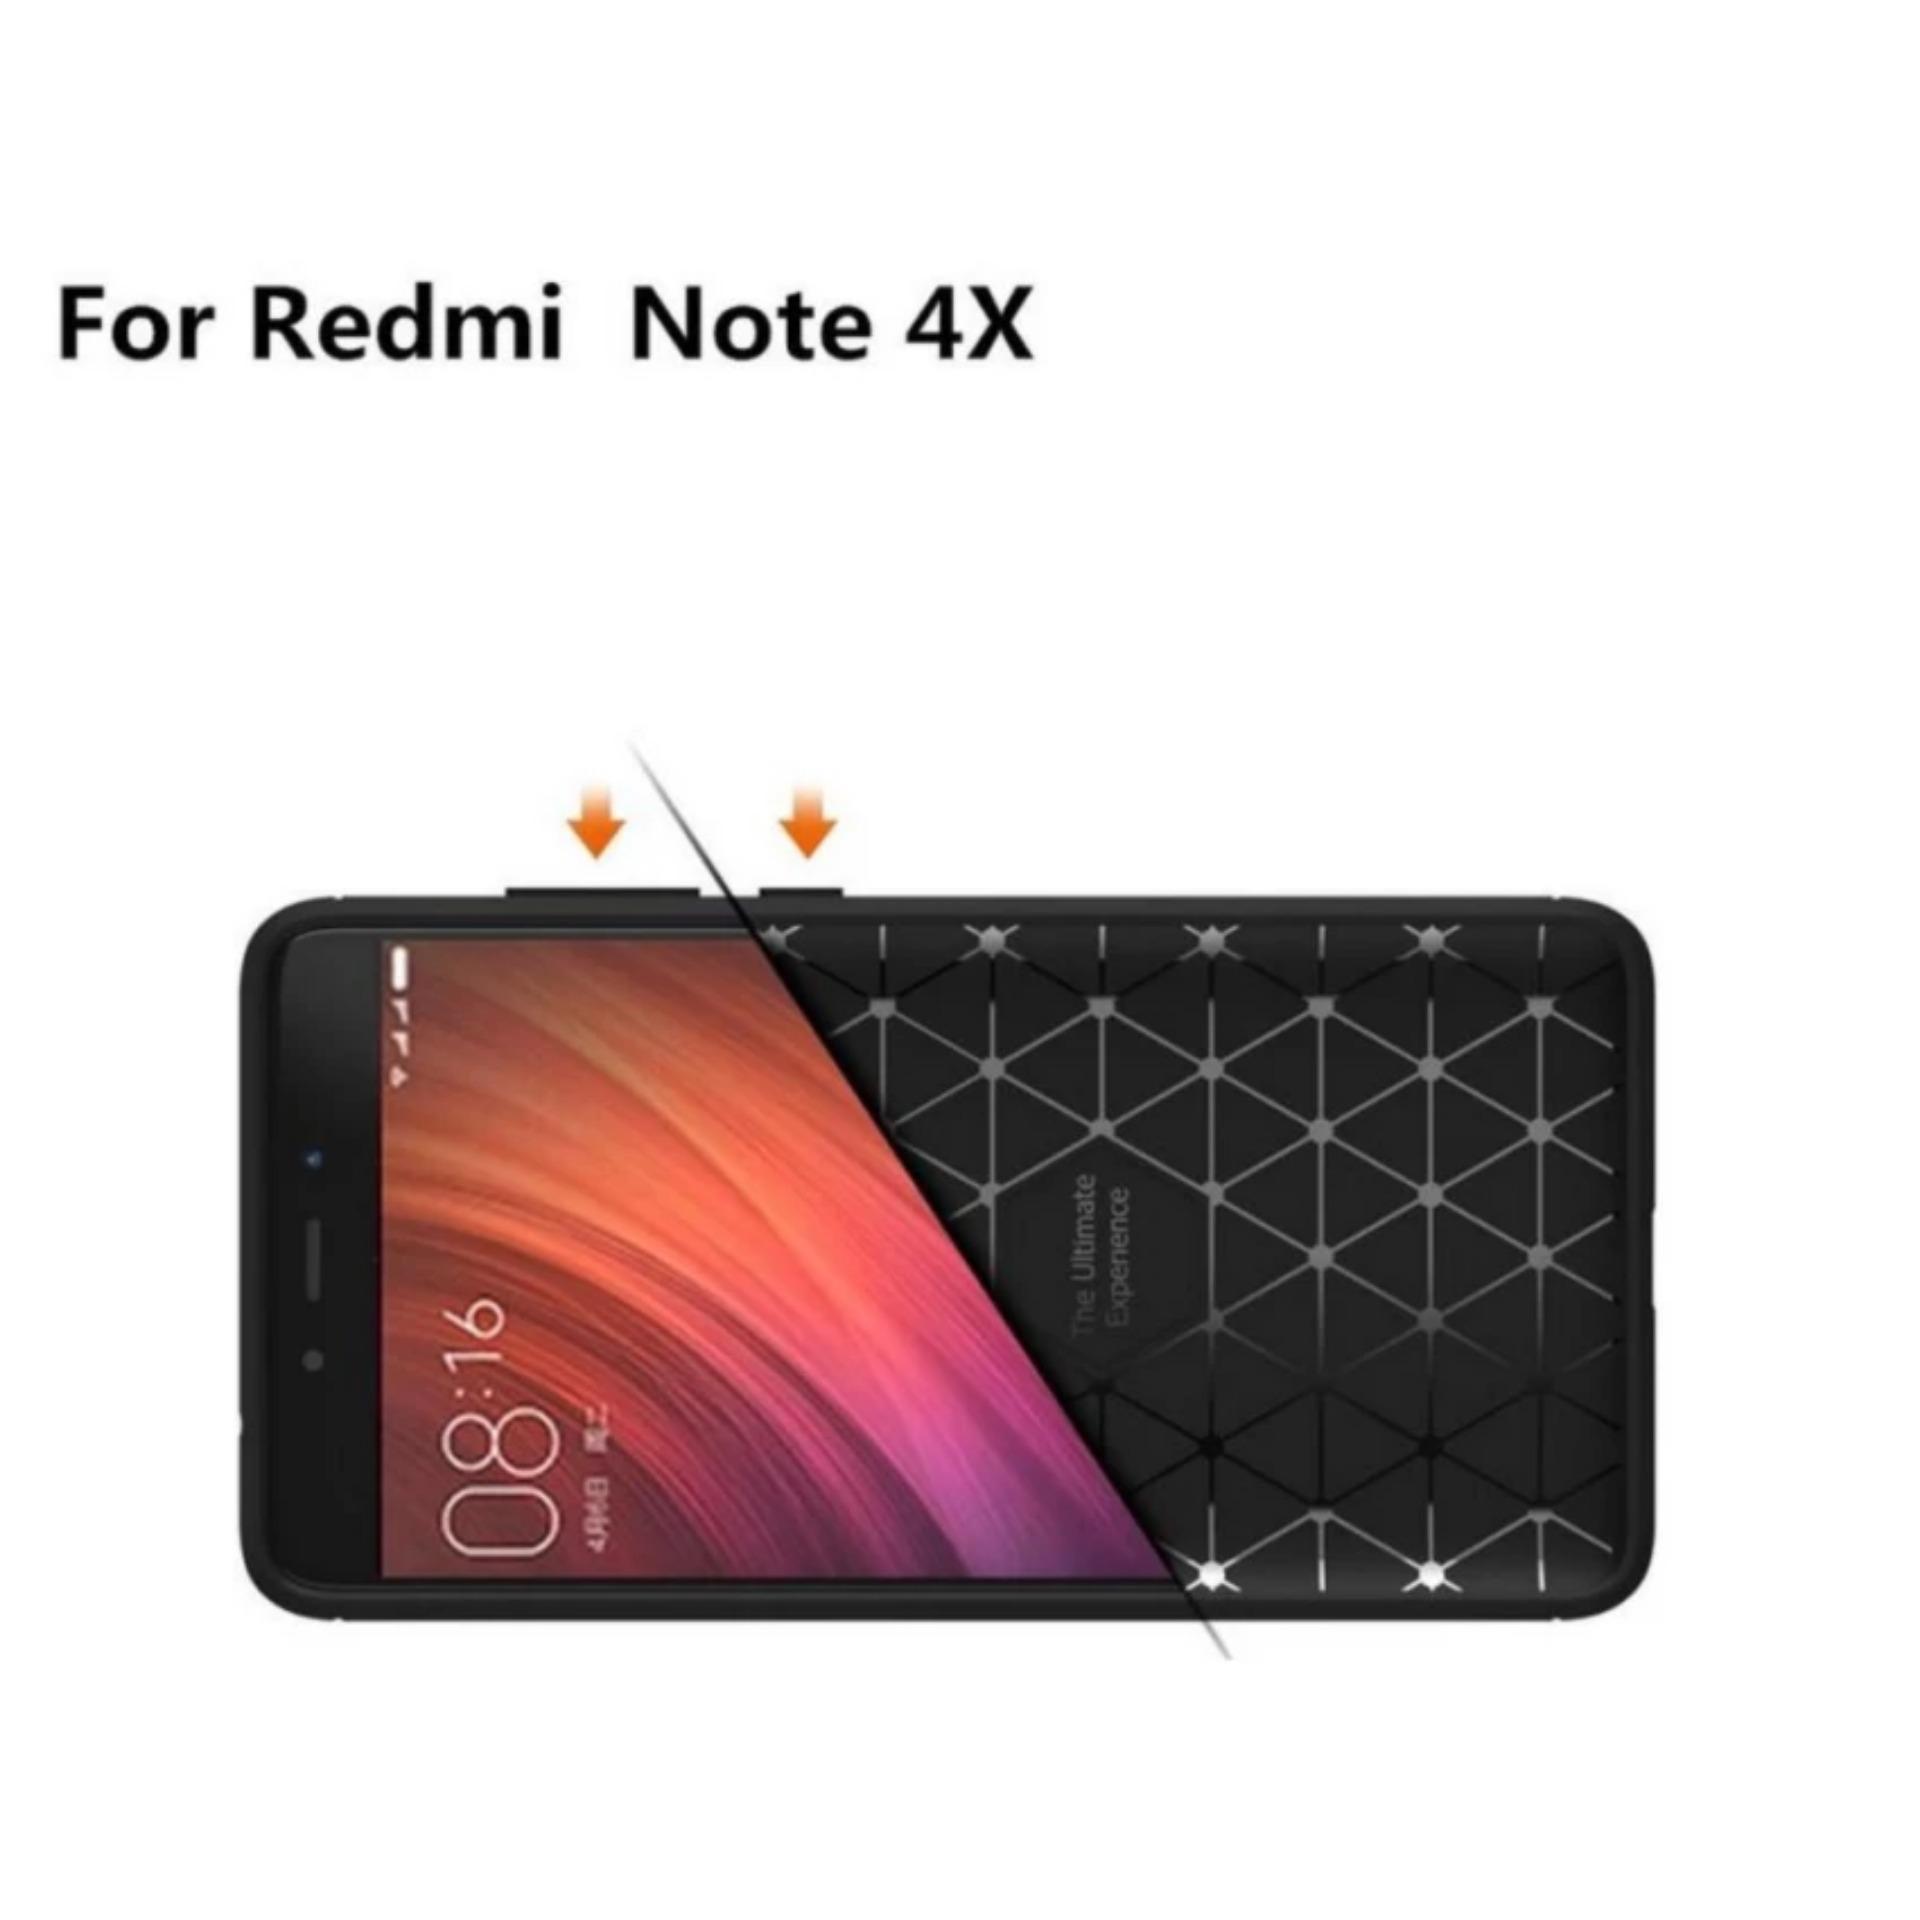 iPaky Carbon Fiber Shockproof Hybrid Case for Xiaomi Redmi Note 4X - Black + Gratis iRing